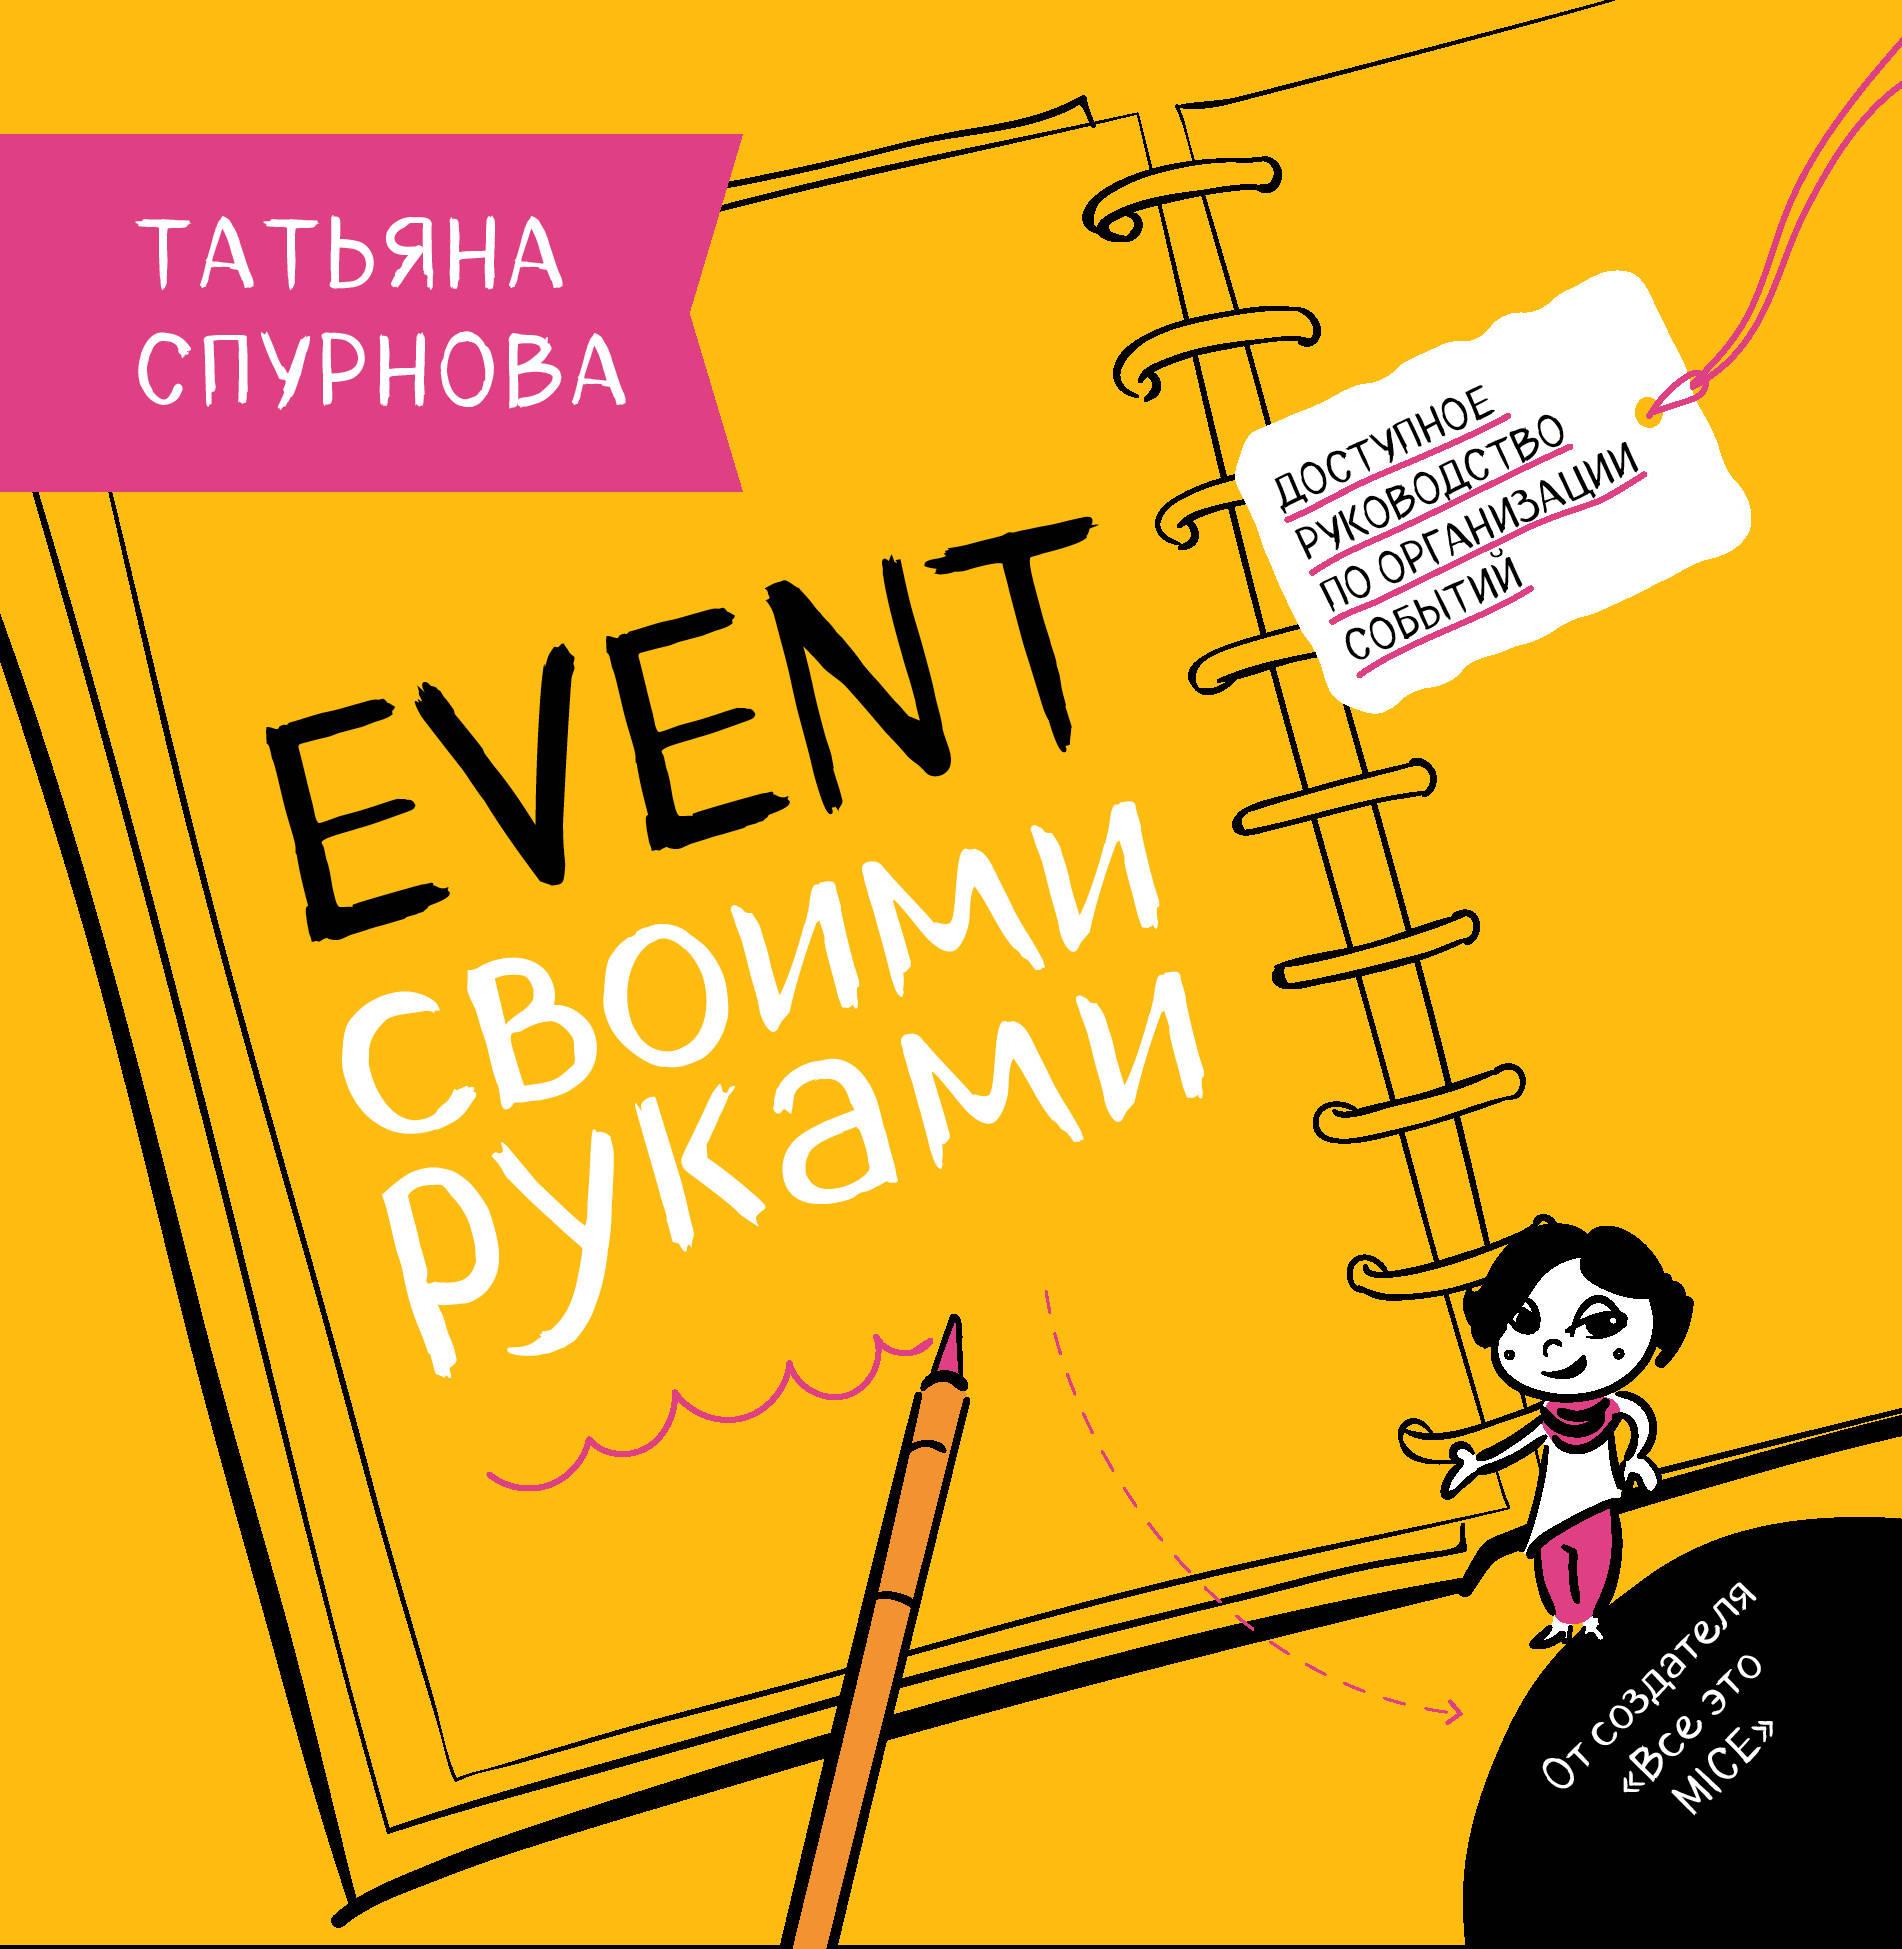 Татьяна Спурнова Event своими руками